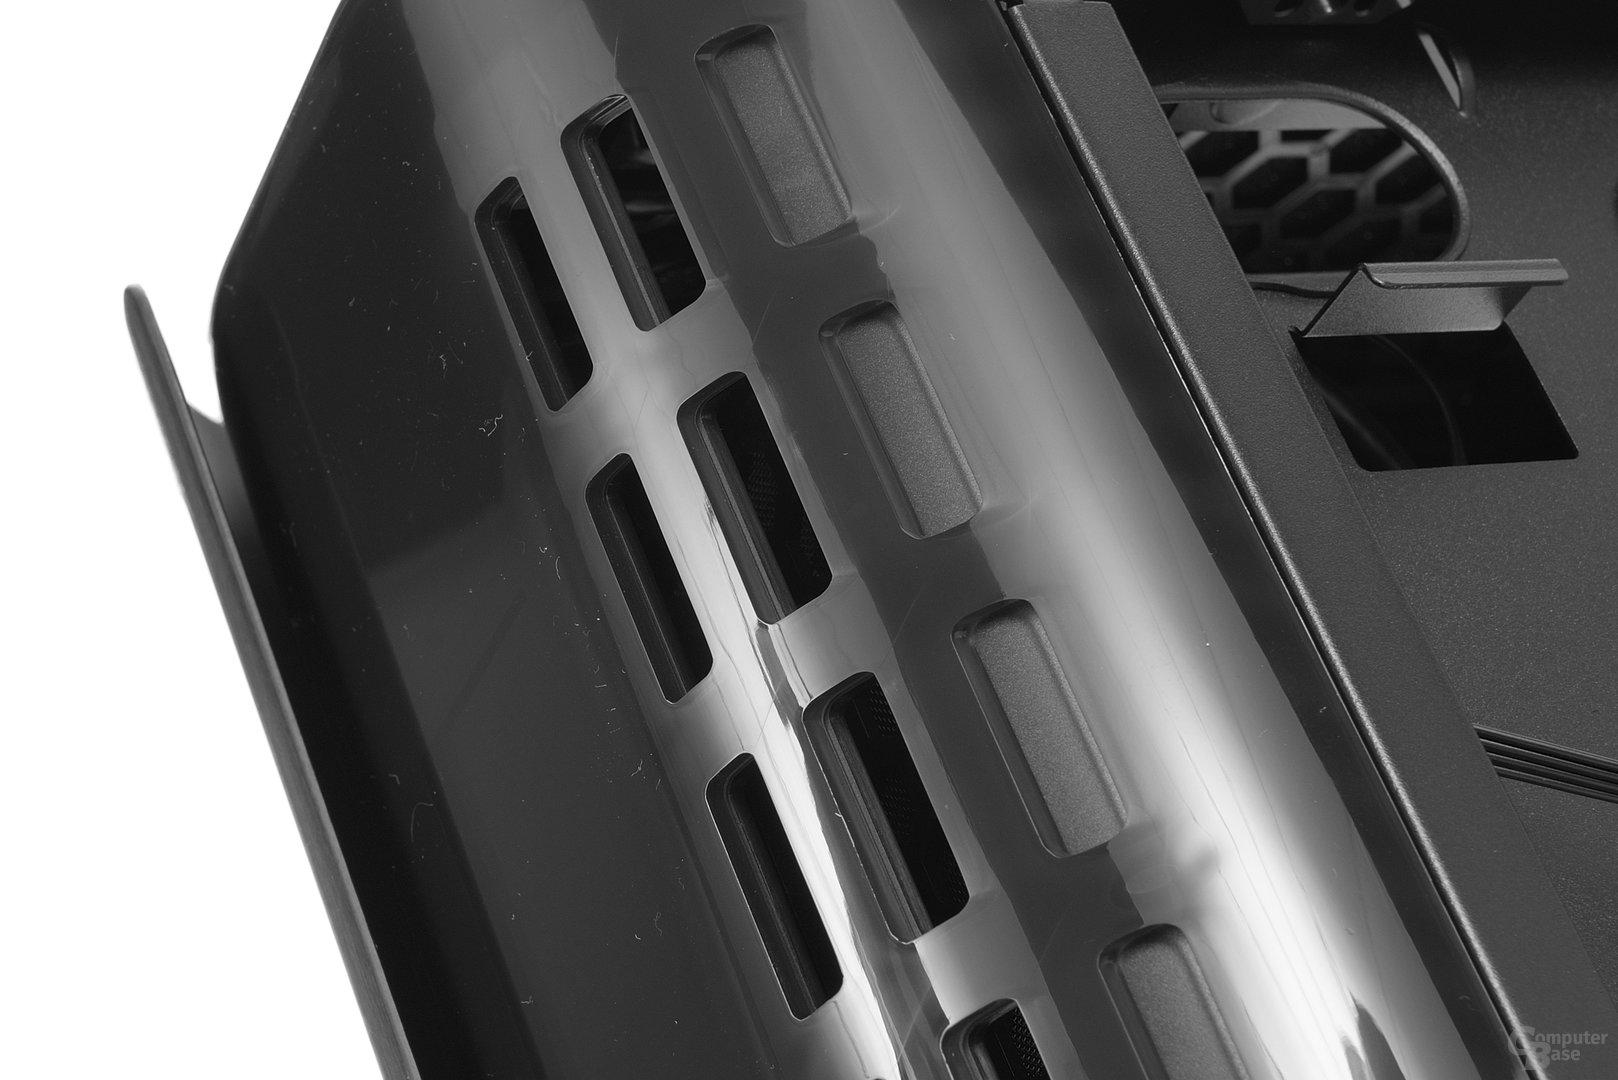 BitFenix Pandora – Lüftungsschlitze in der Front